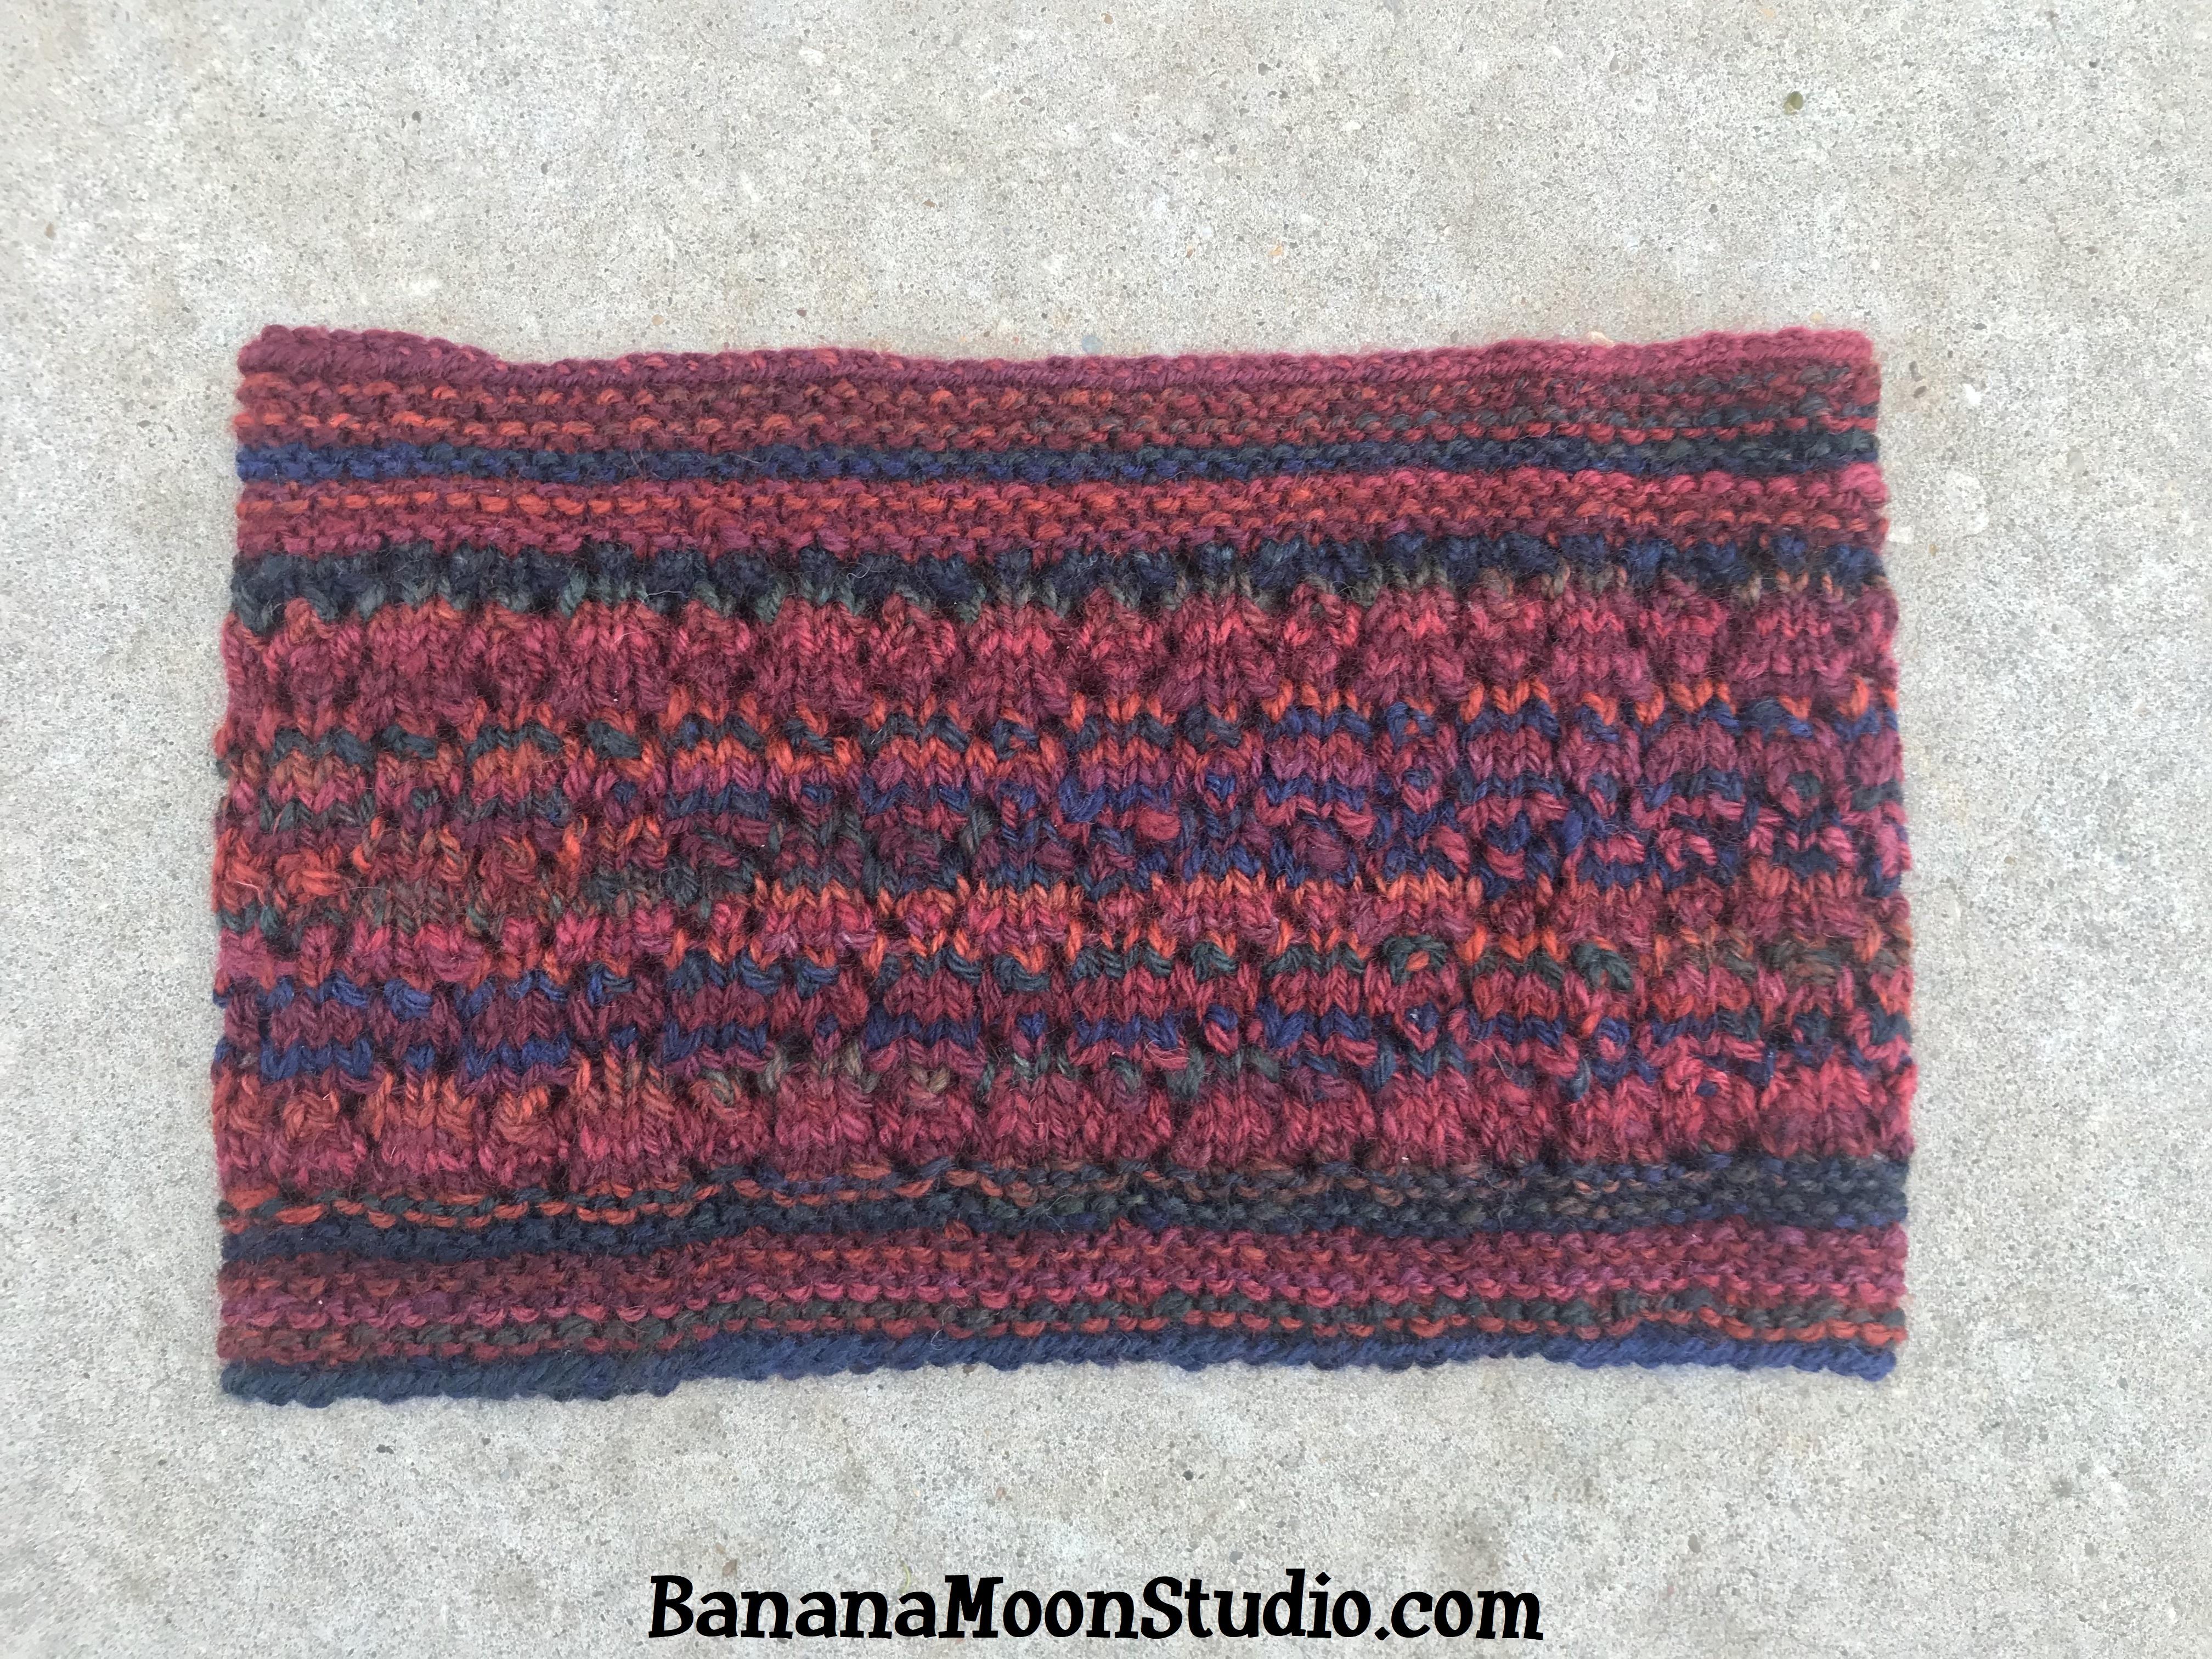 Free knitting pattern for a cowl, Lumi Cowl, by April Garwood of Banana Moon Studio 5